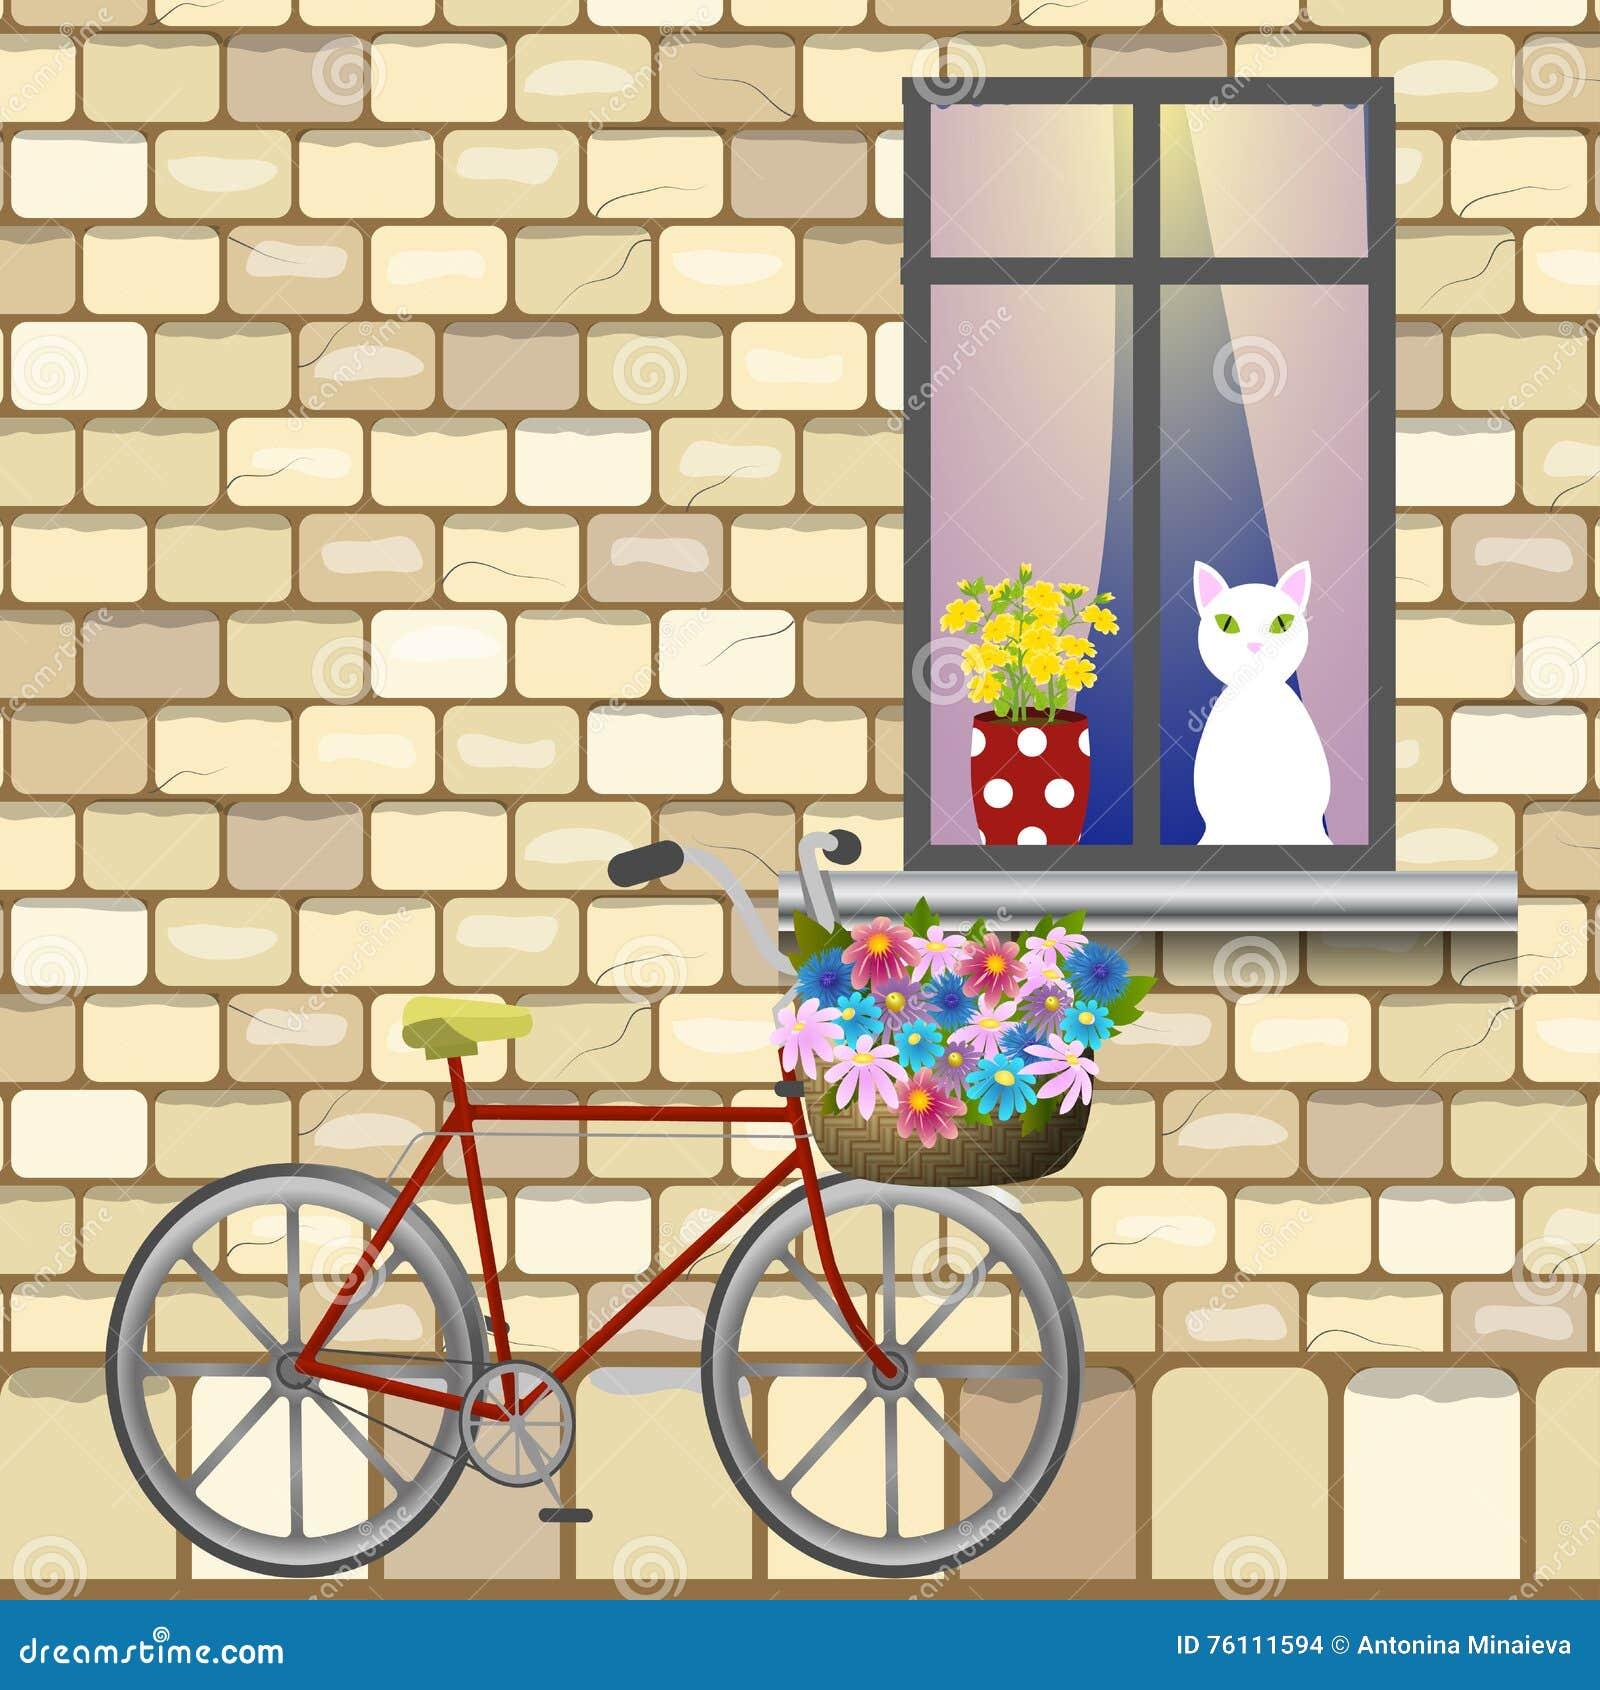 Bike under window stock vector. Illustration of green - 76111594